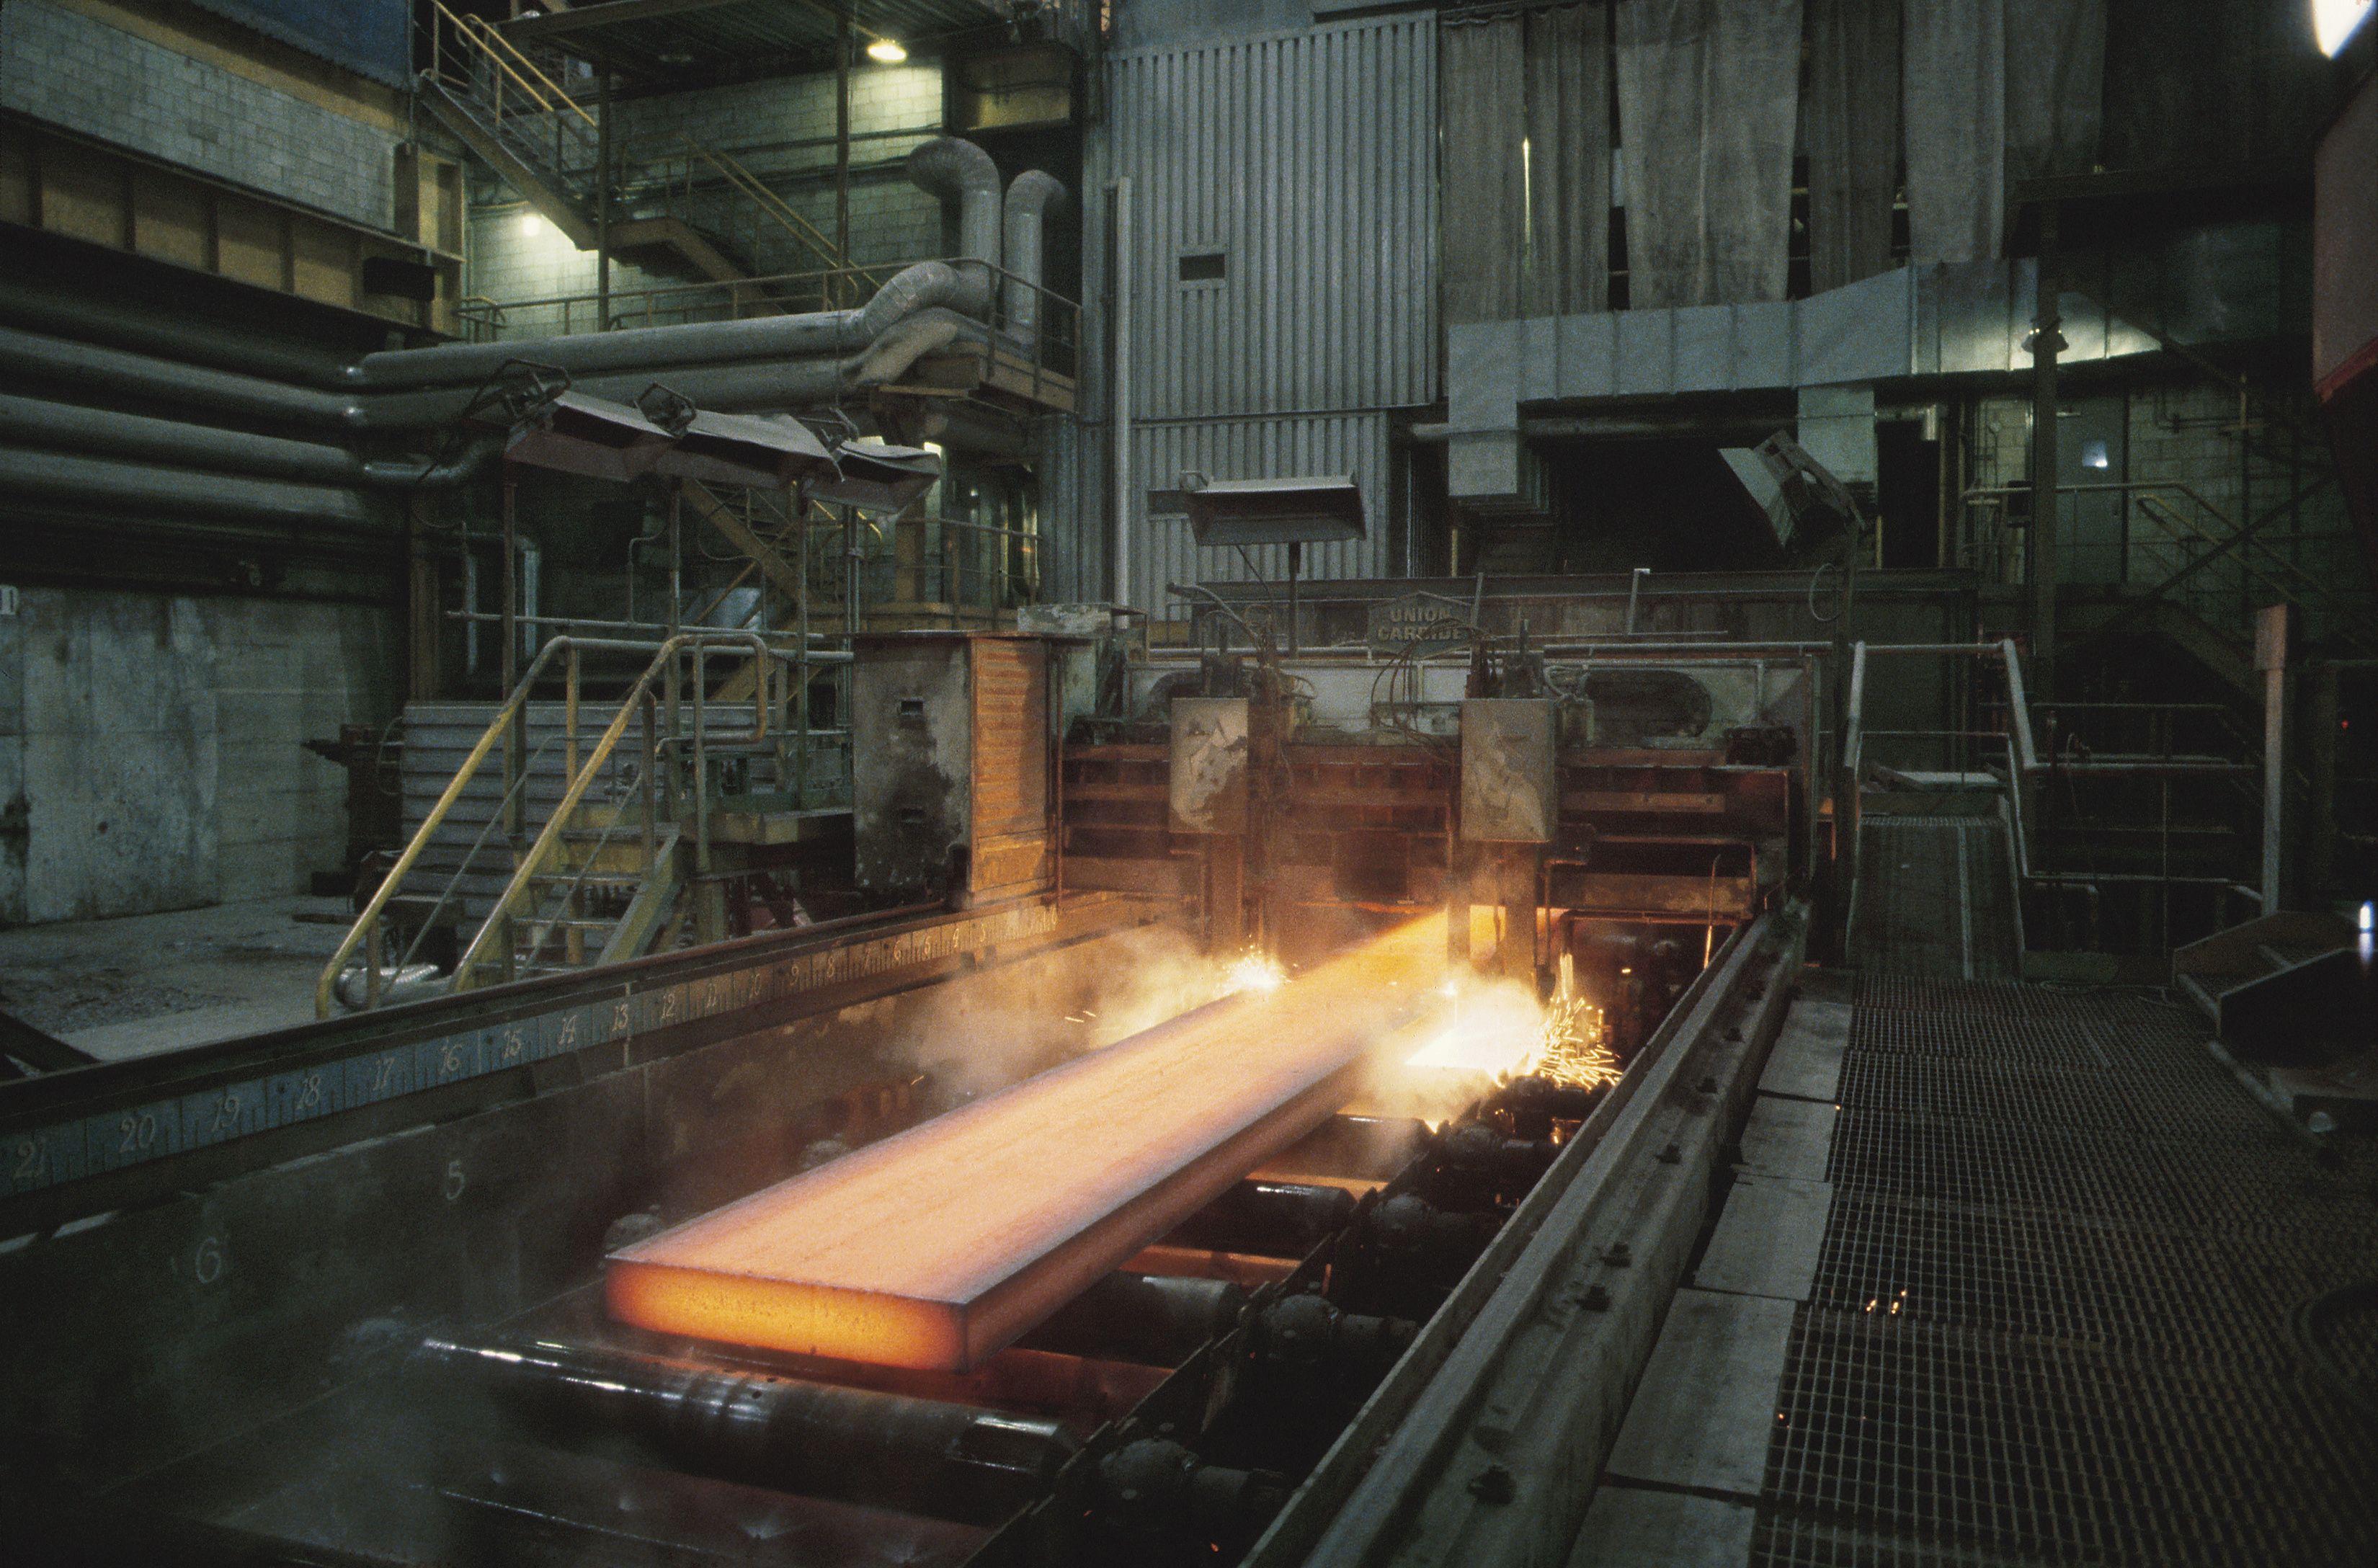 How To Heat Treat 1095 Steel Ehow Com In 2020 1095 Steel Heat Treating High Carbon Steel